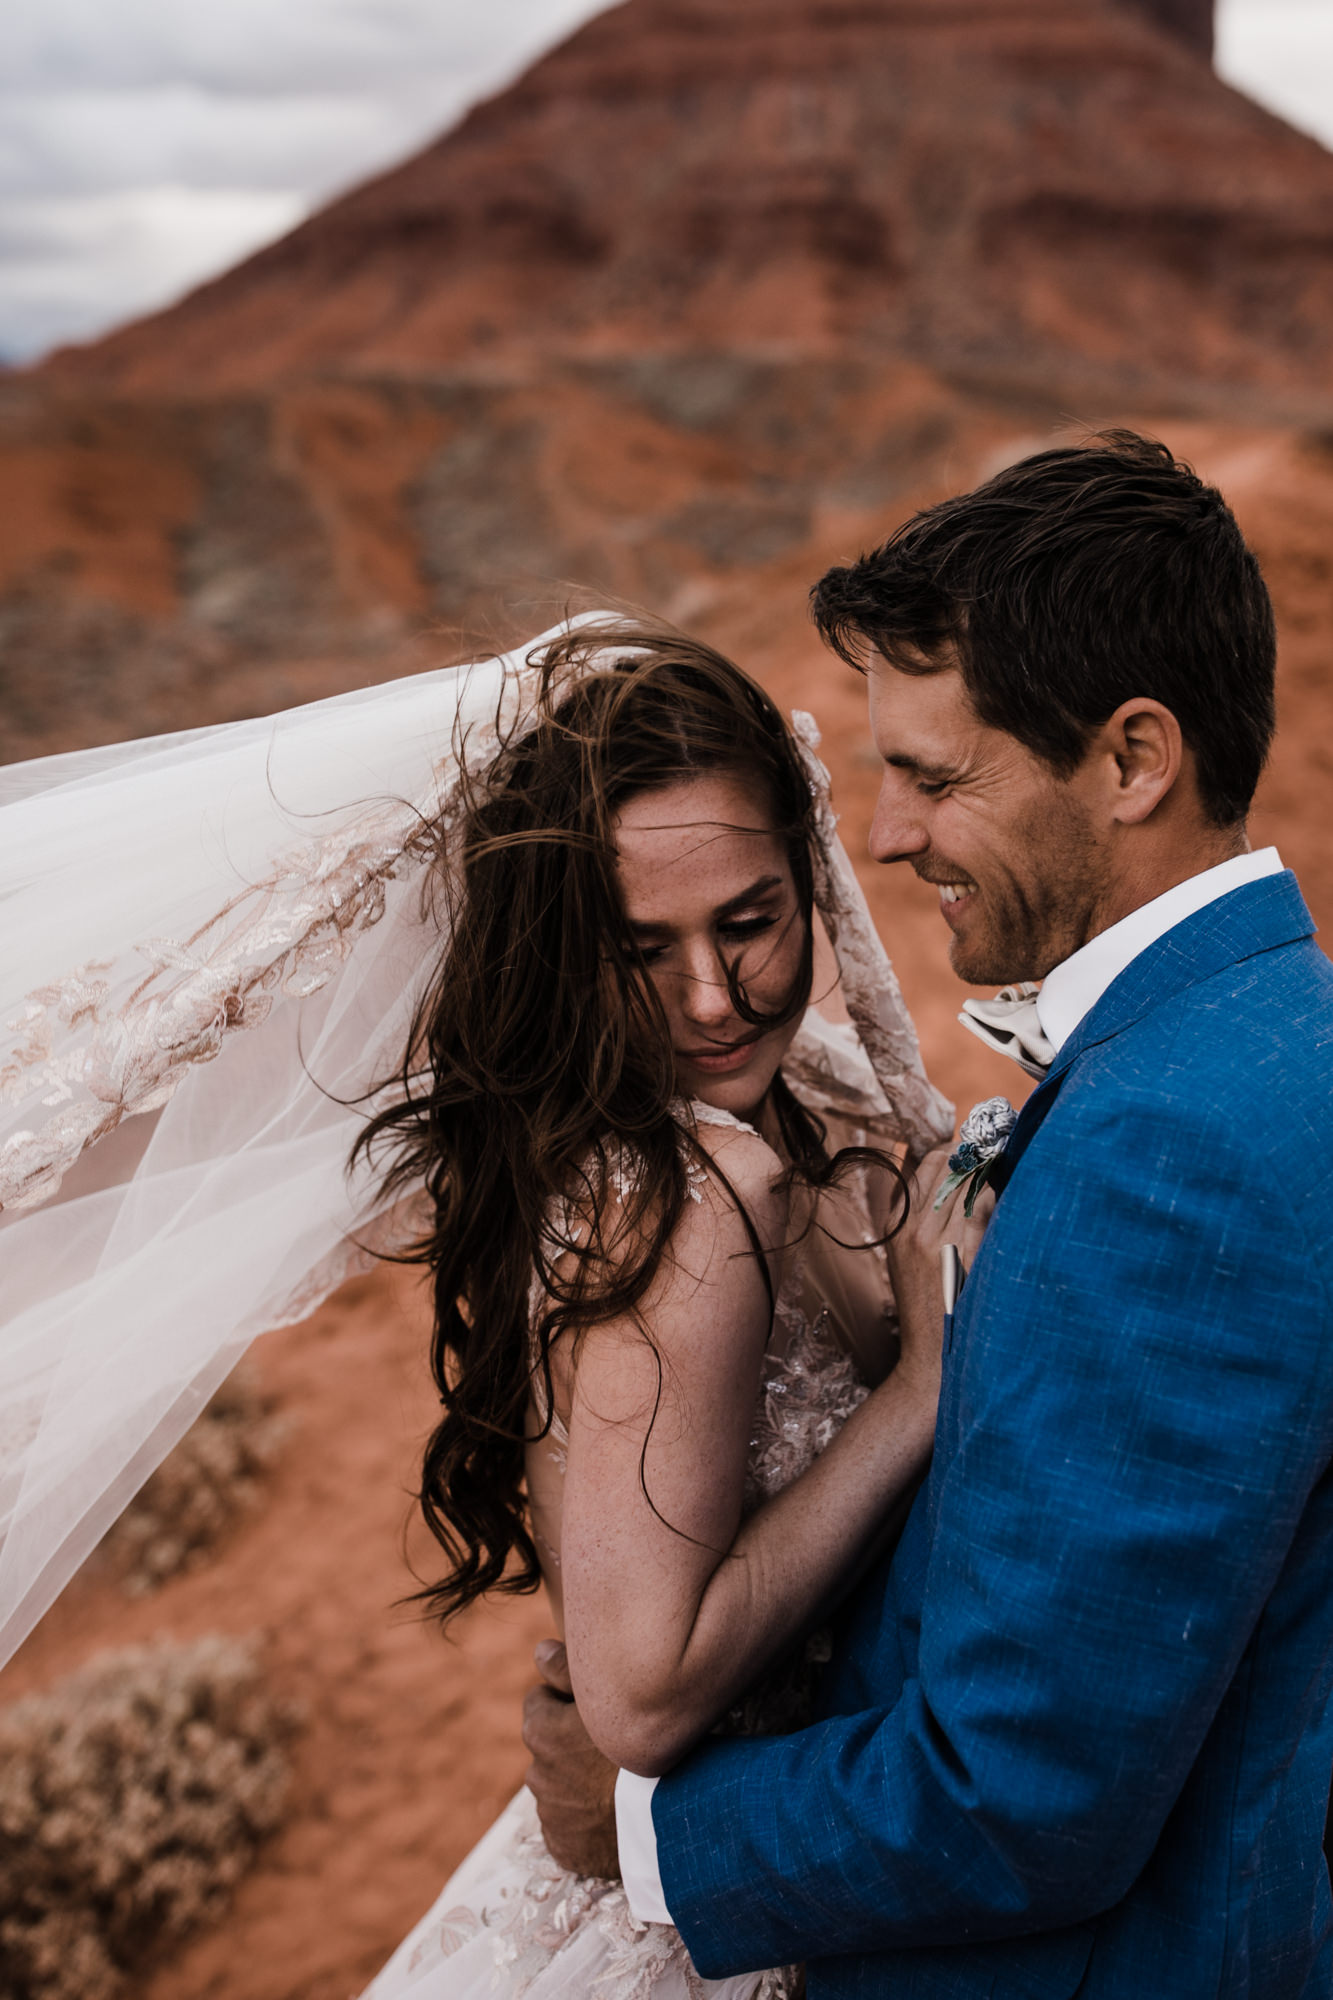 moab, utah spacenet wedding day | destination adventure wedding photographers | the hearnes adventure photography | www.thehearnes.com